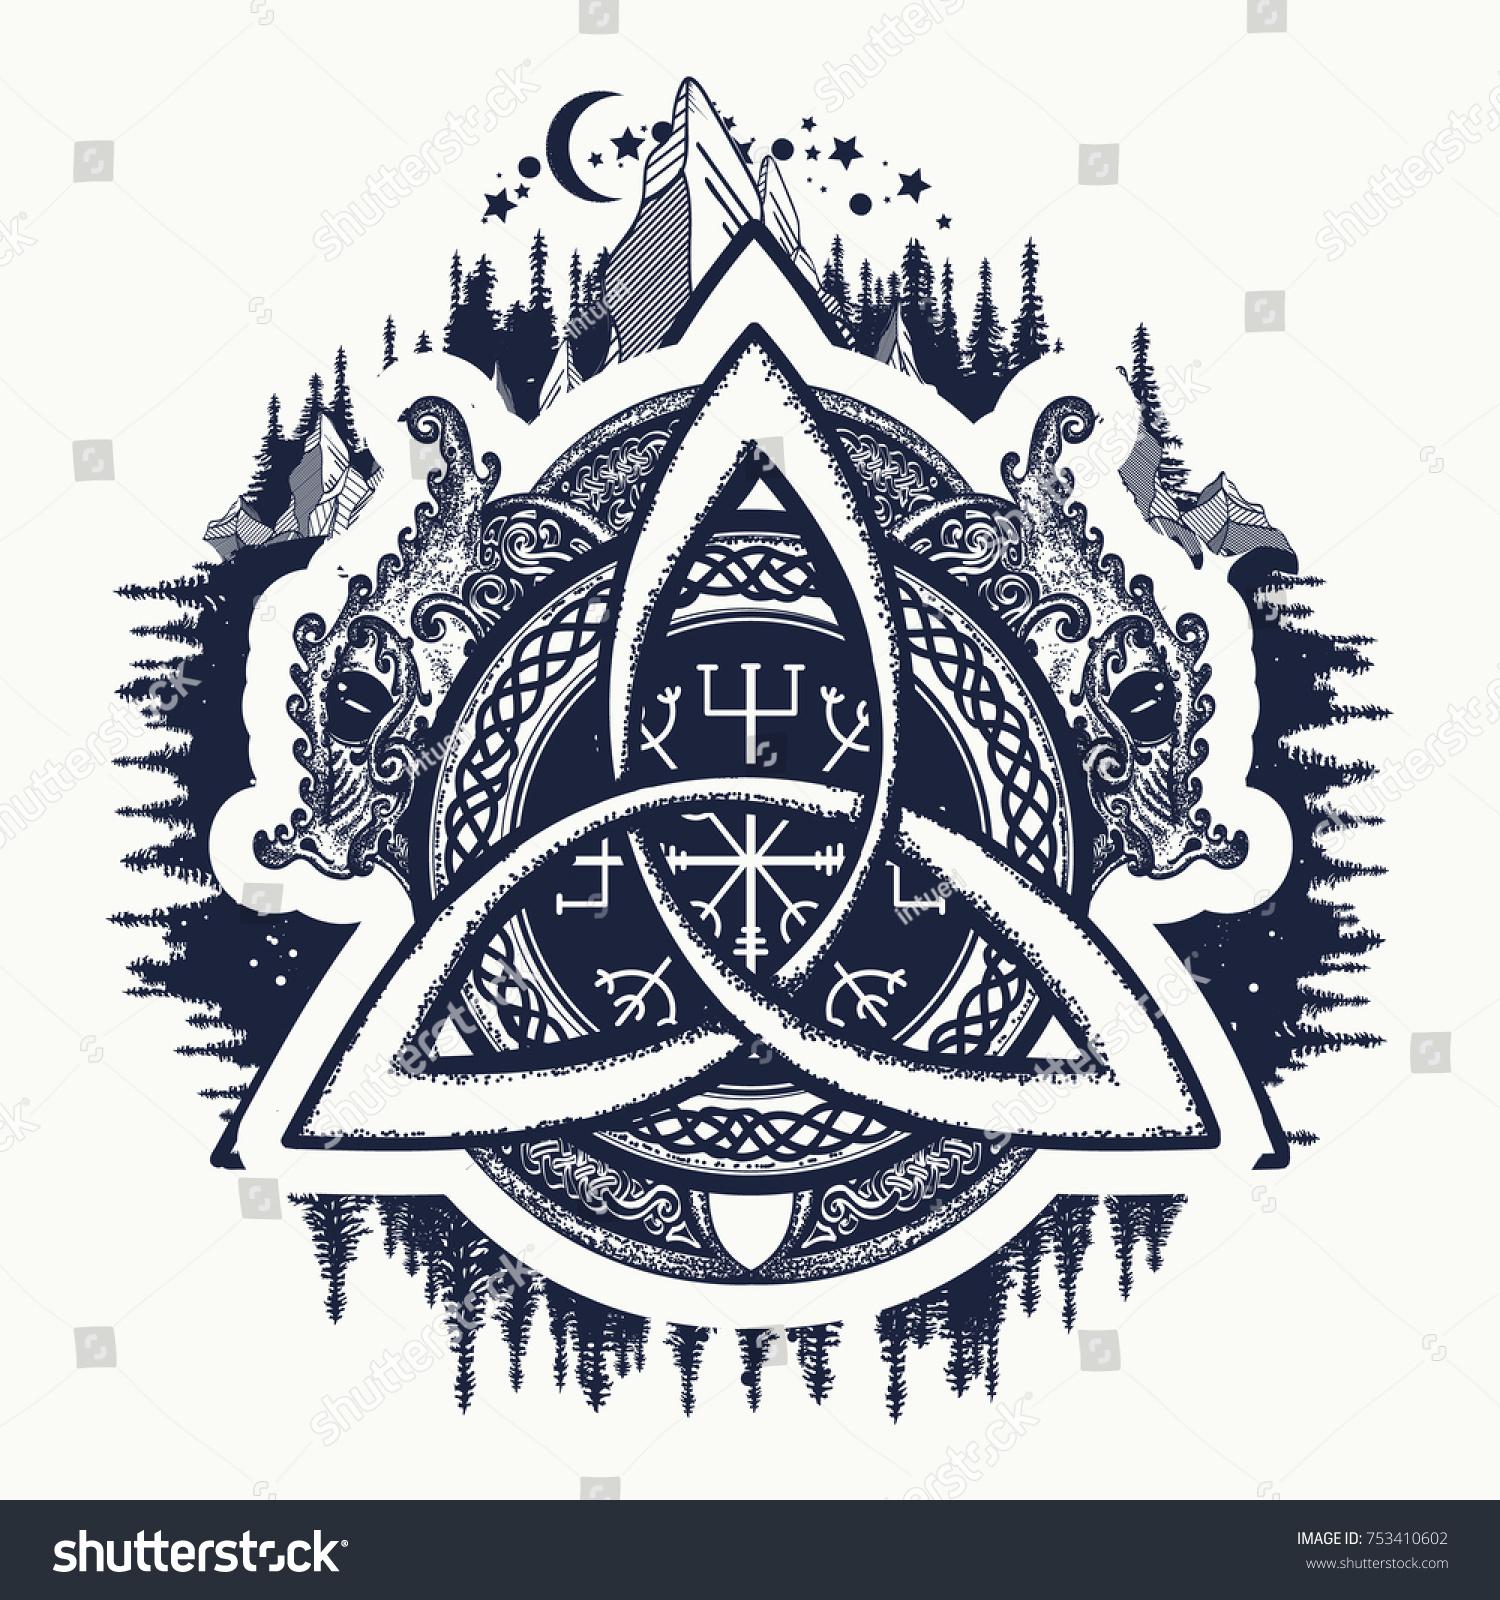 tatouage symbole viking best la rose des vents trouver son chemin with tatouage symbole viking. Black Bedroom Furniture Sets. Home Design Ideas